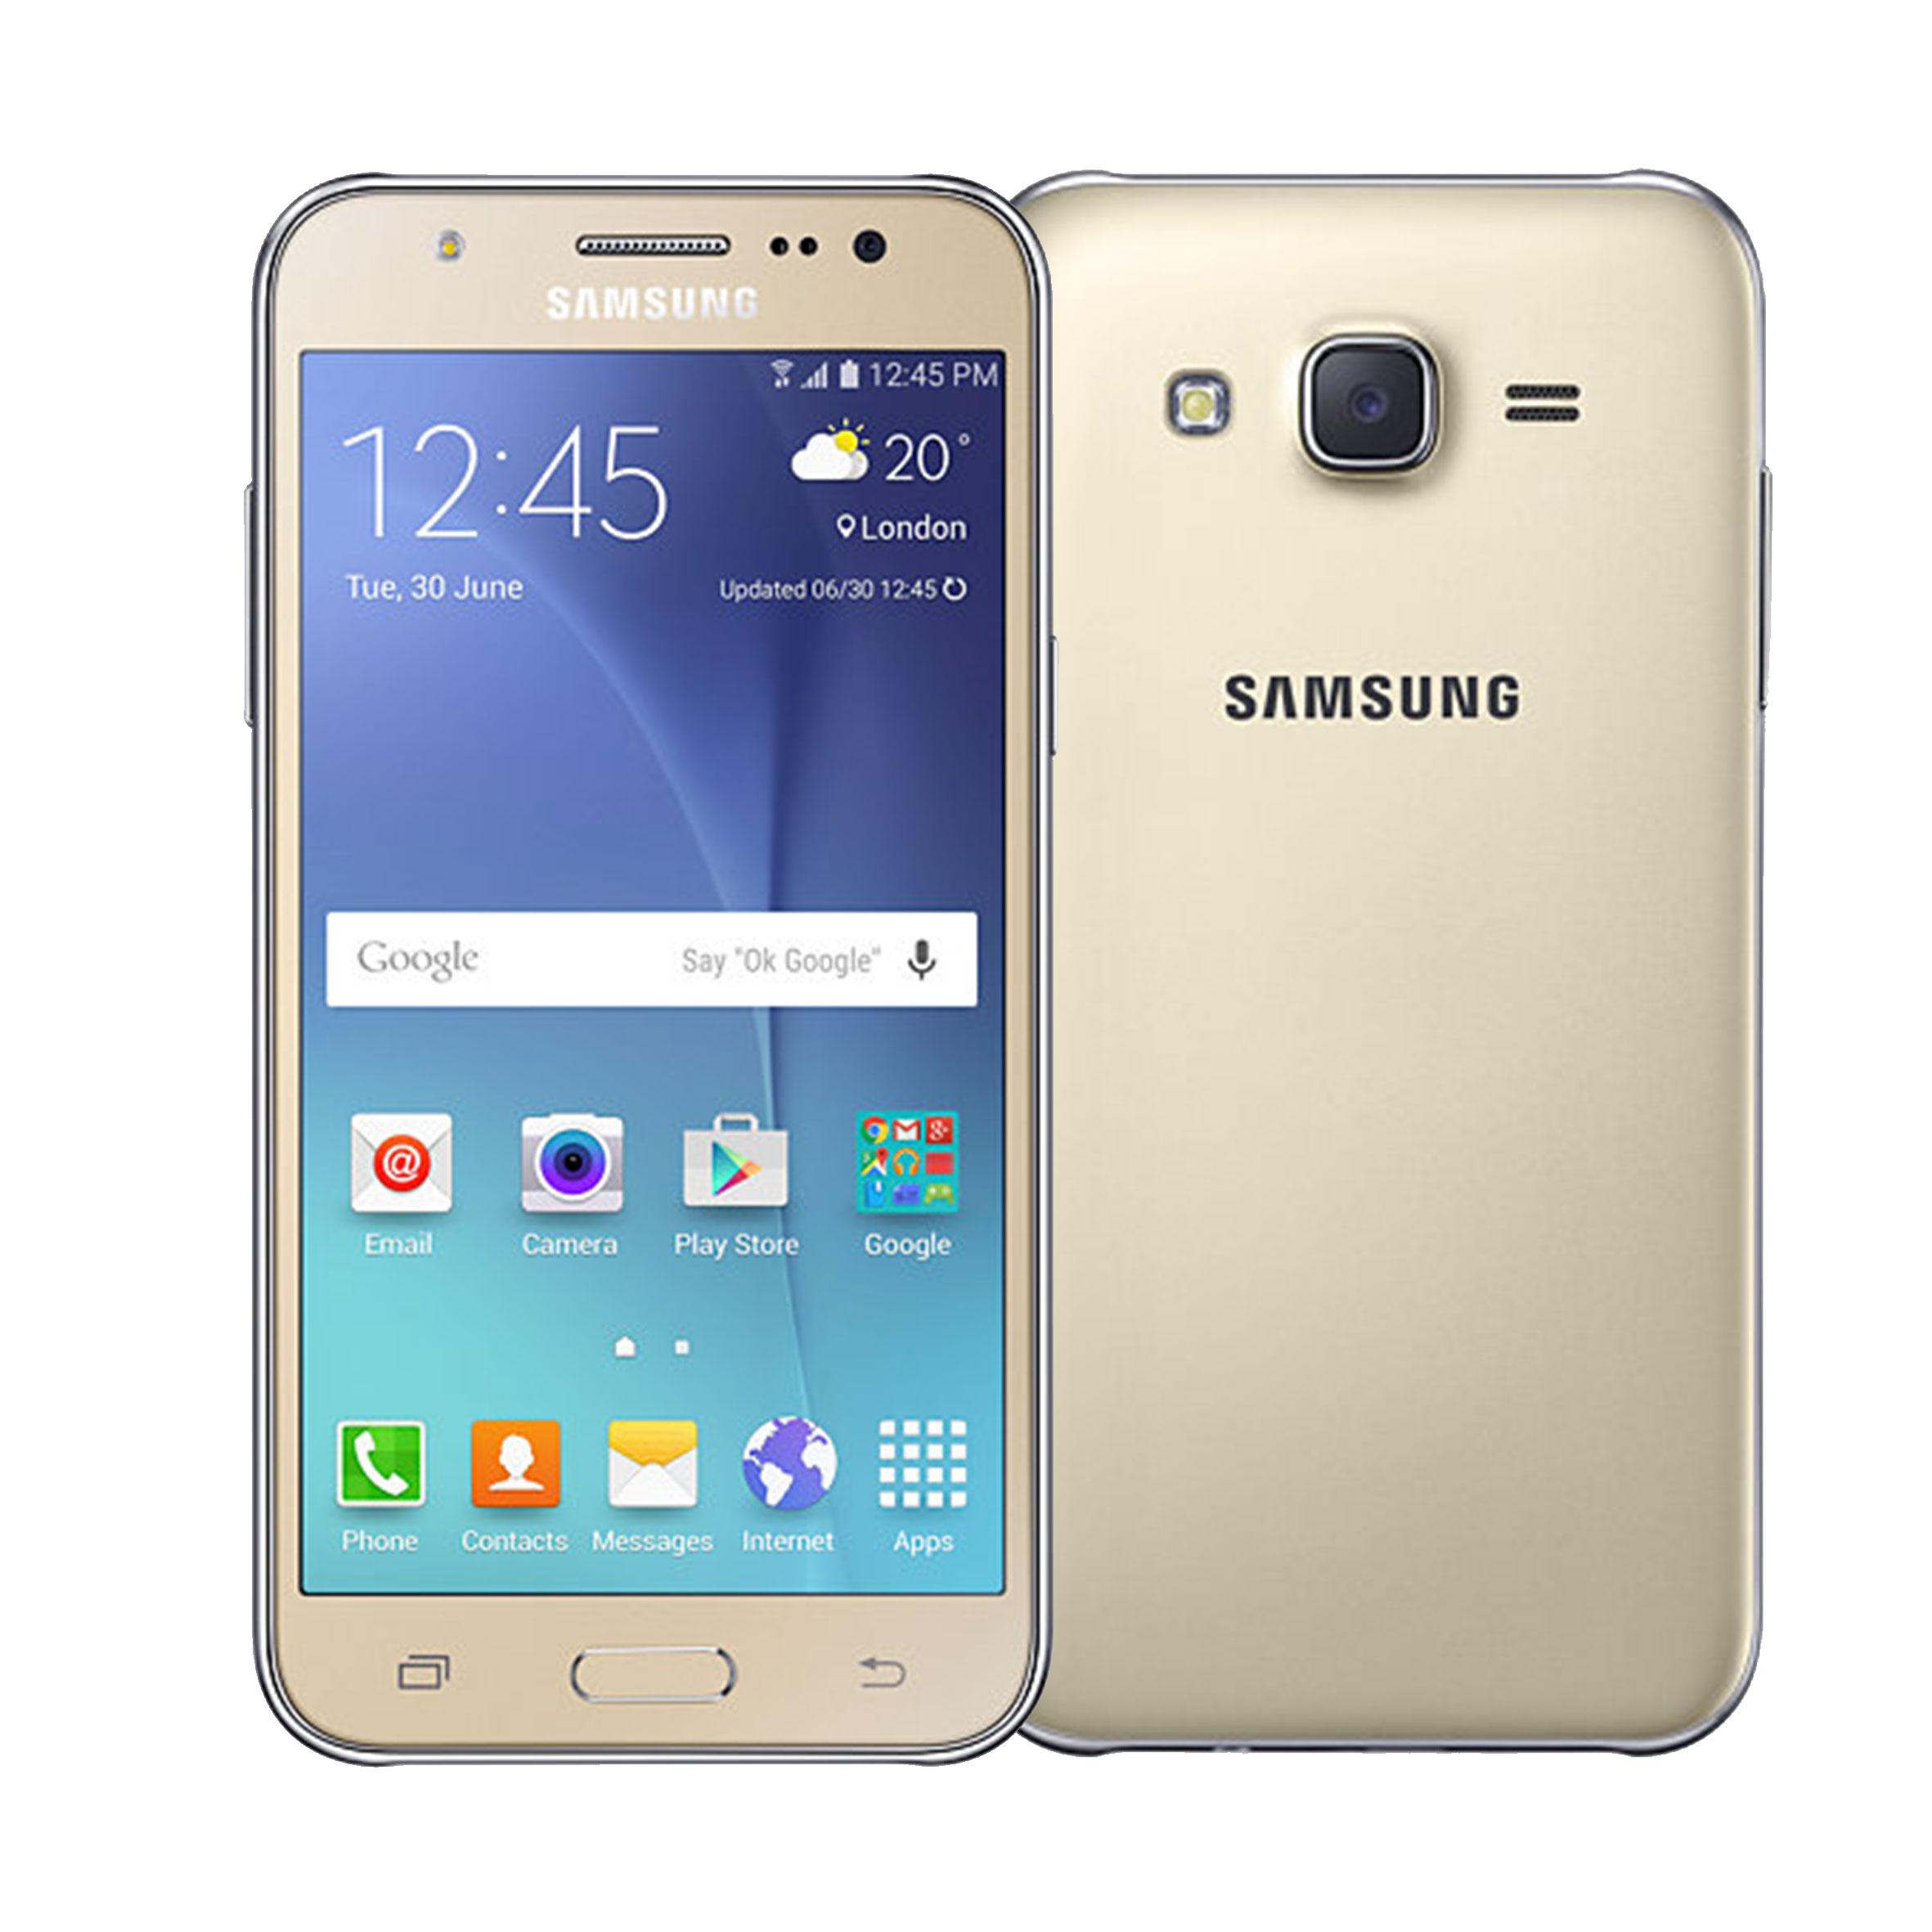 Samsung Galaxy J5 Smartphone 8gb Brand Bazaar